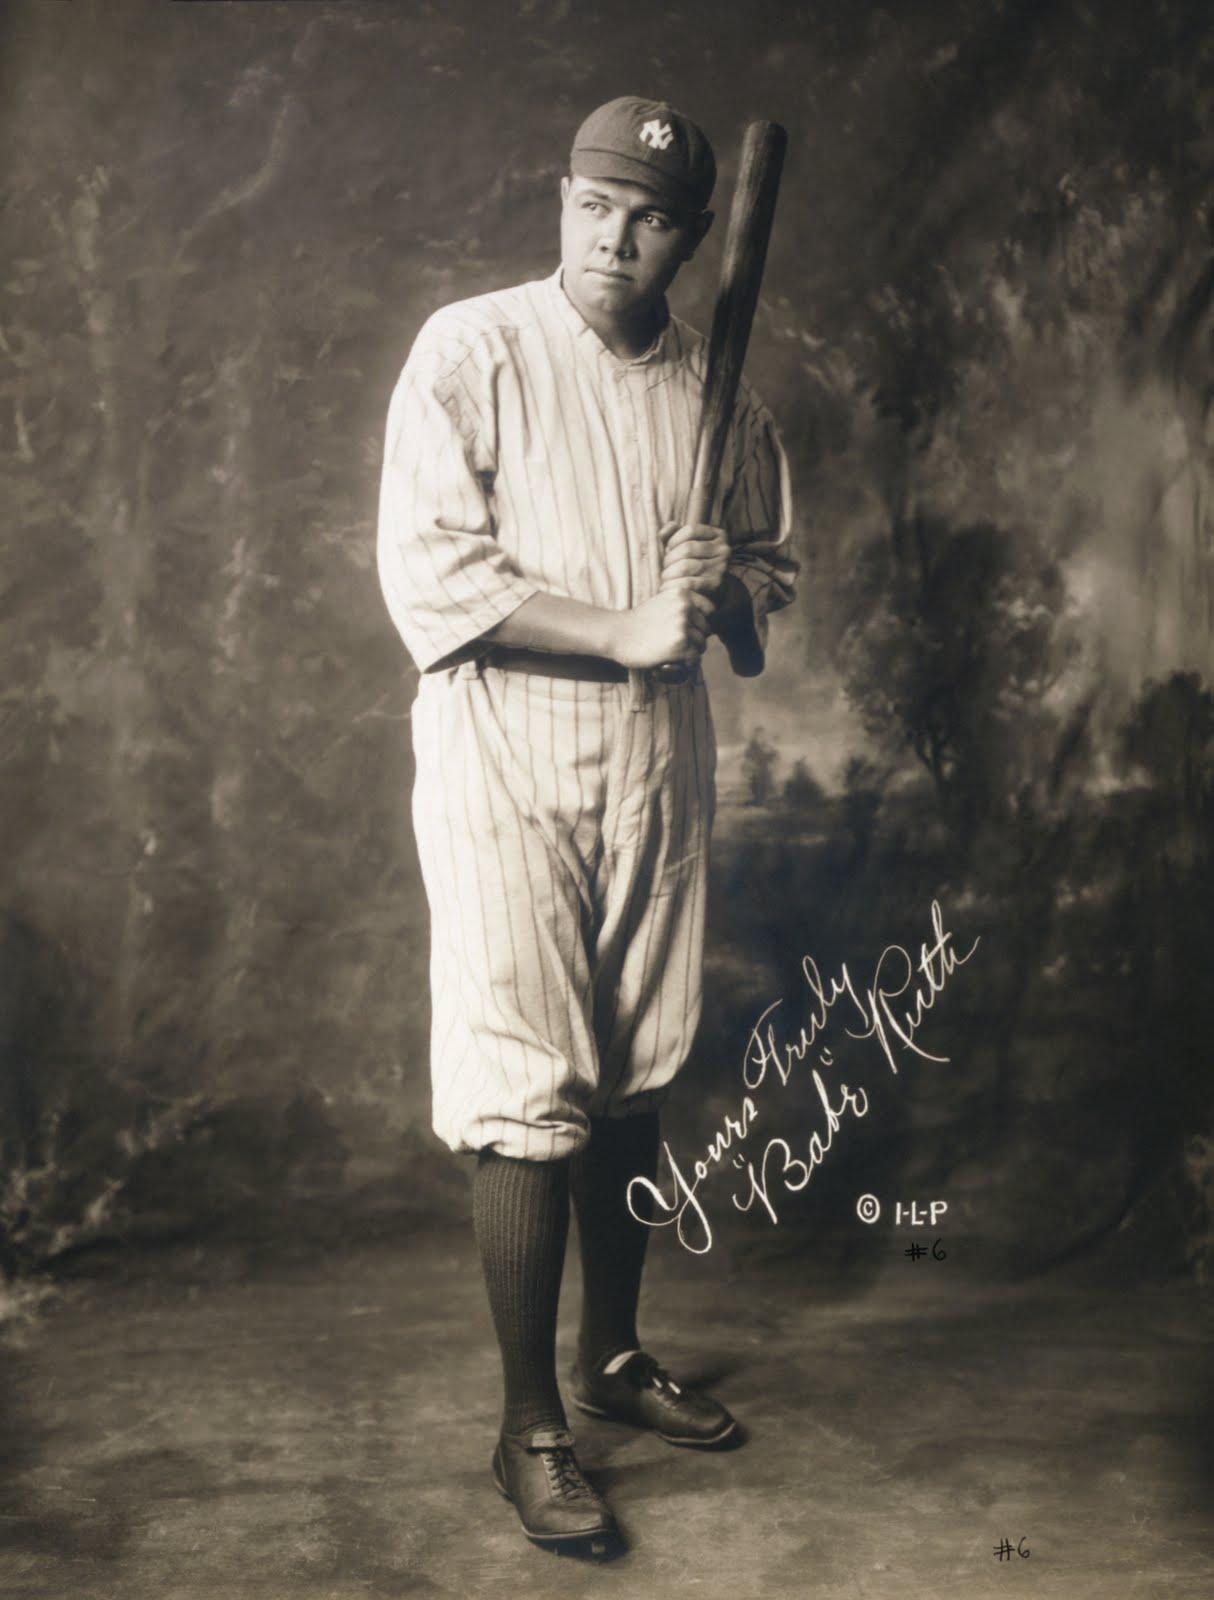 Babe Ruth in baseball uniform, holding baseball bat ... Babe Ruth